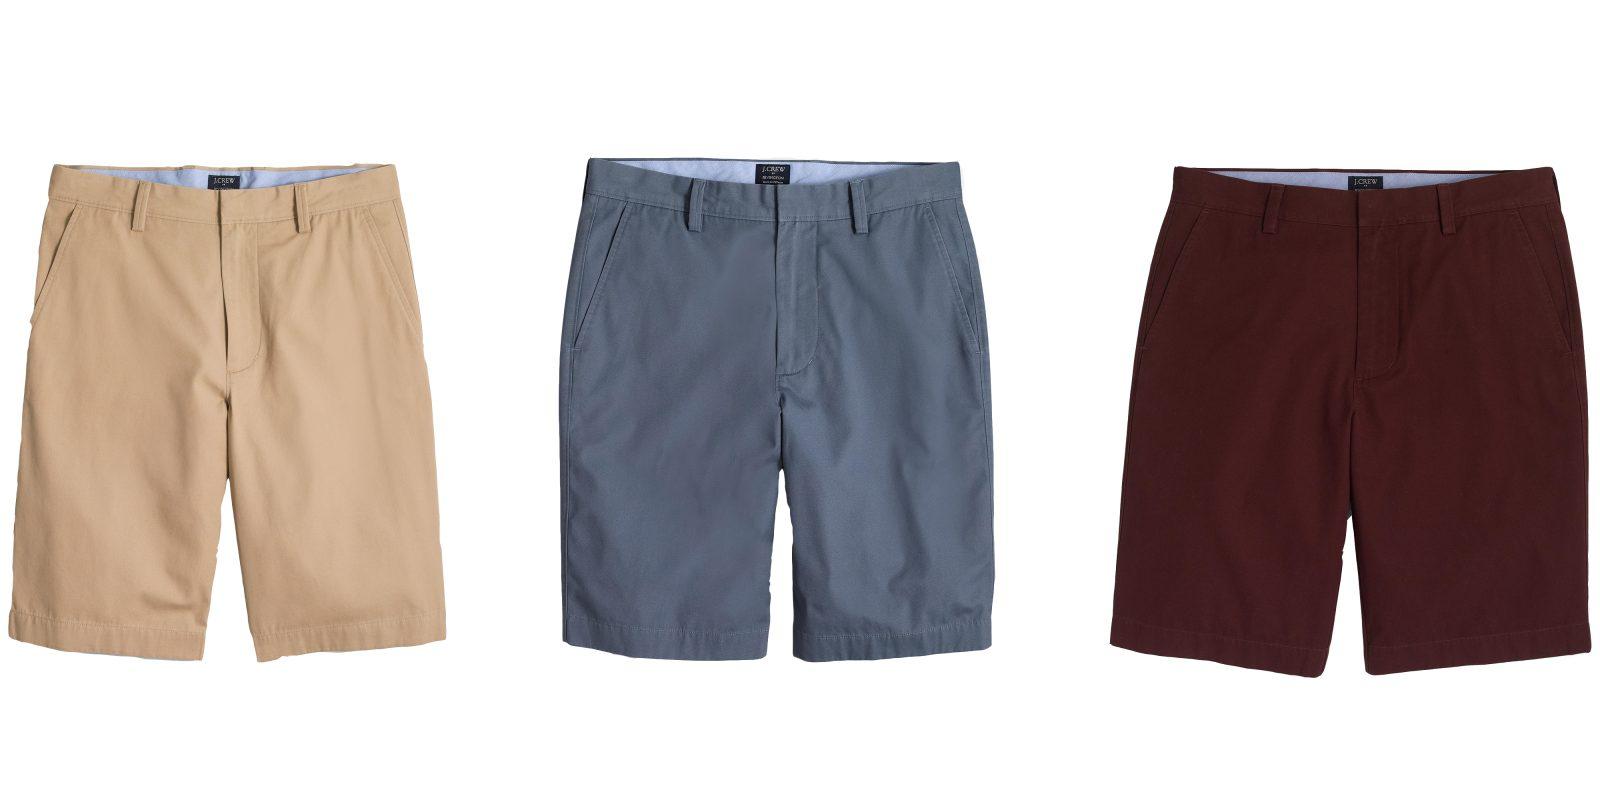 cc7108e0e3c Fashion  J. Crew Factory shorts  25